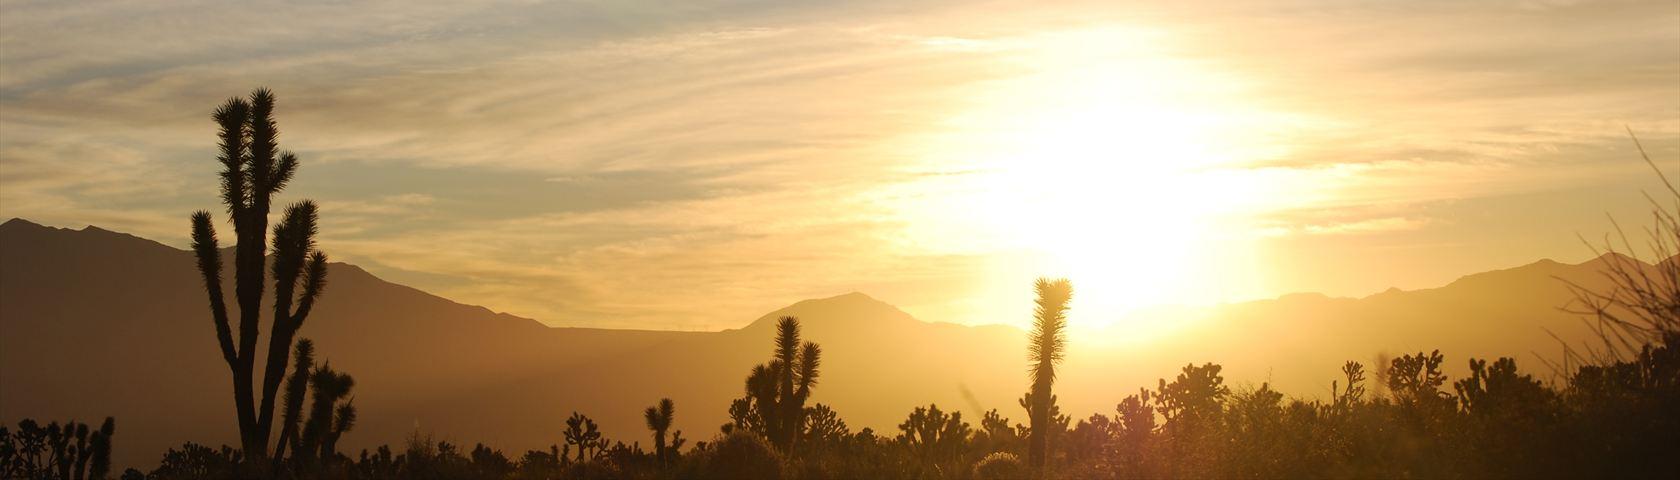 Sunrise in the Mojave